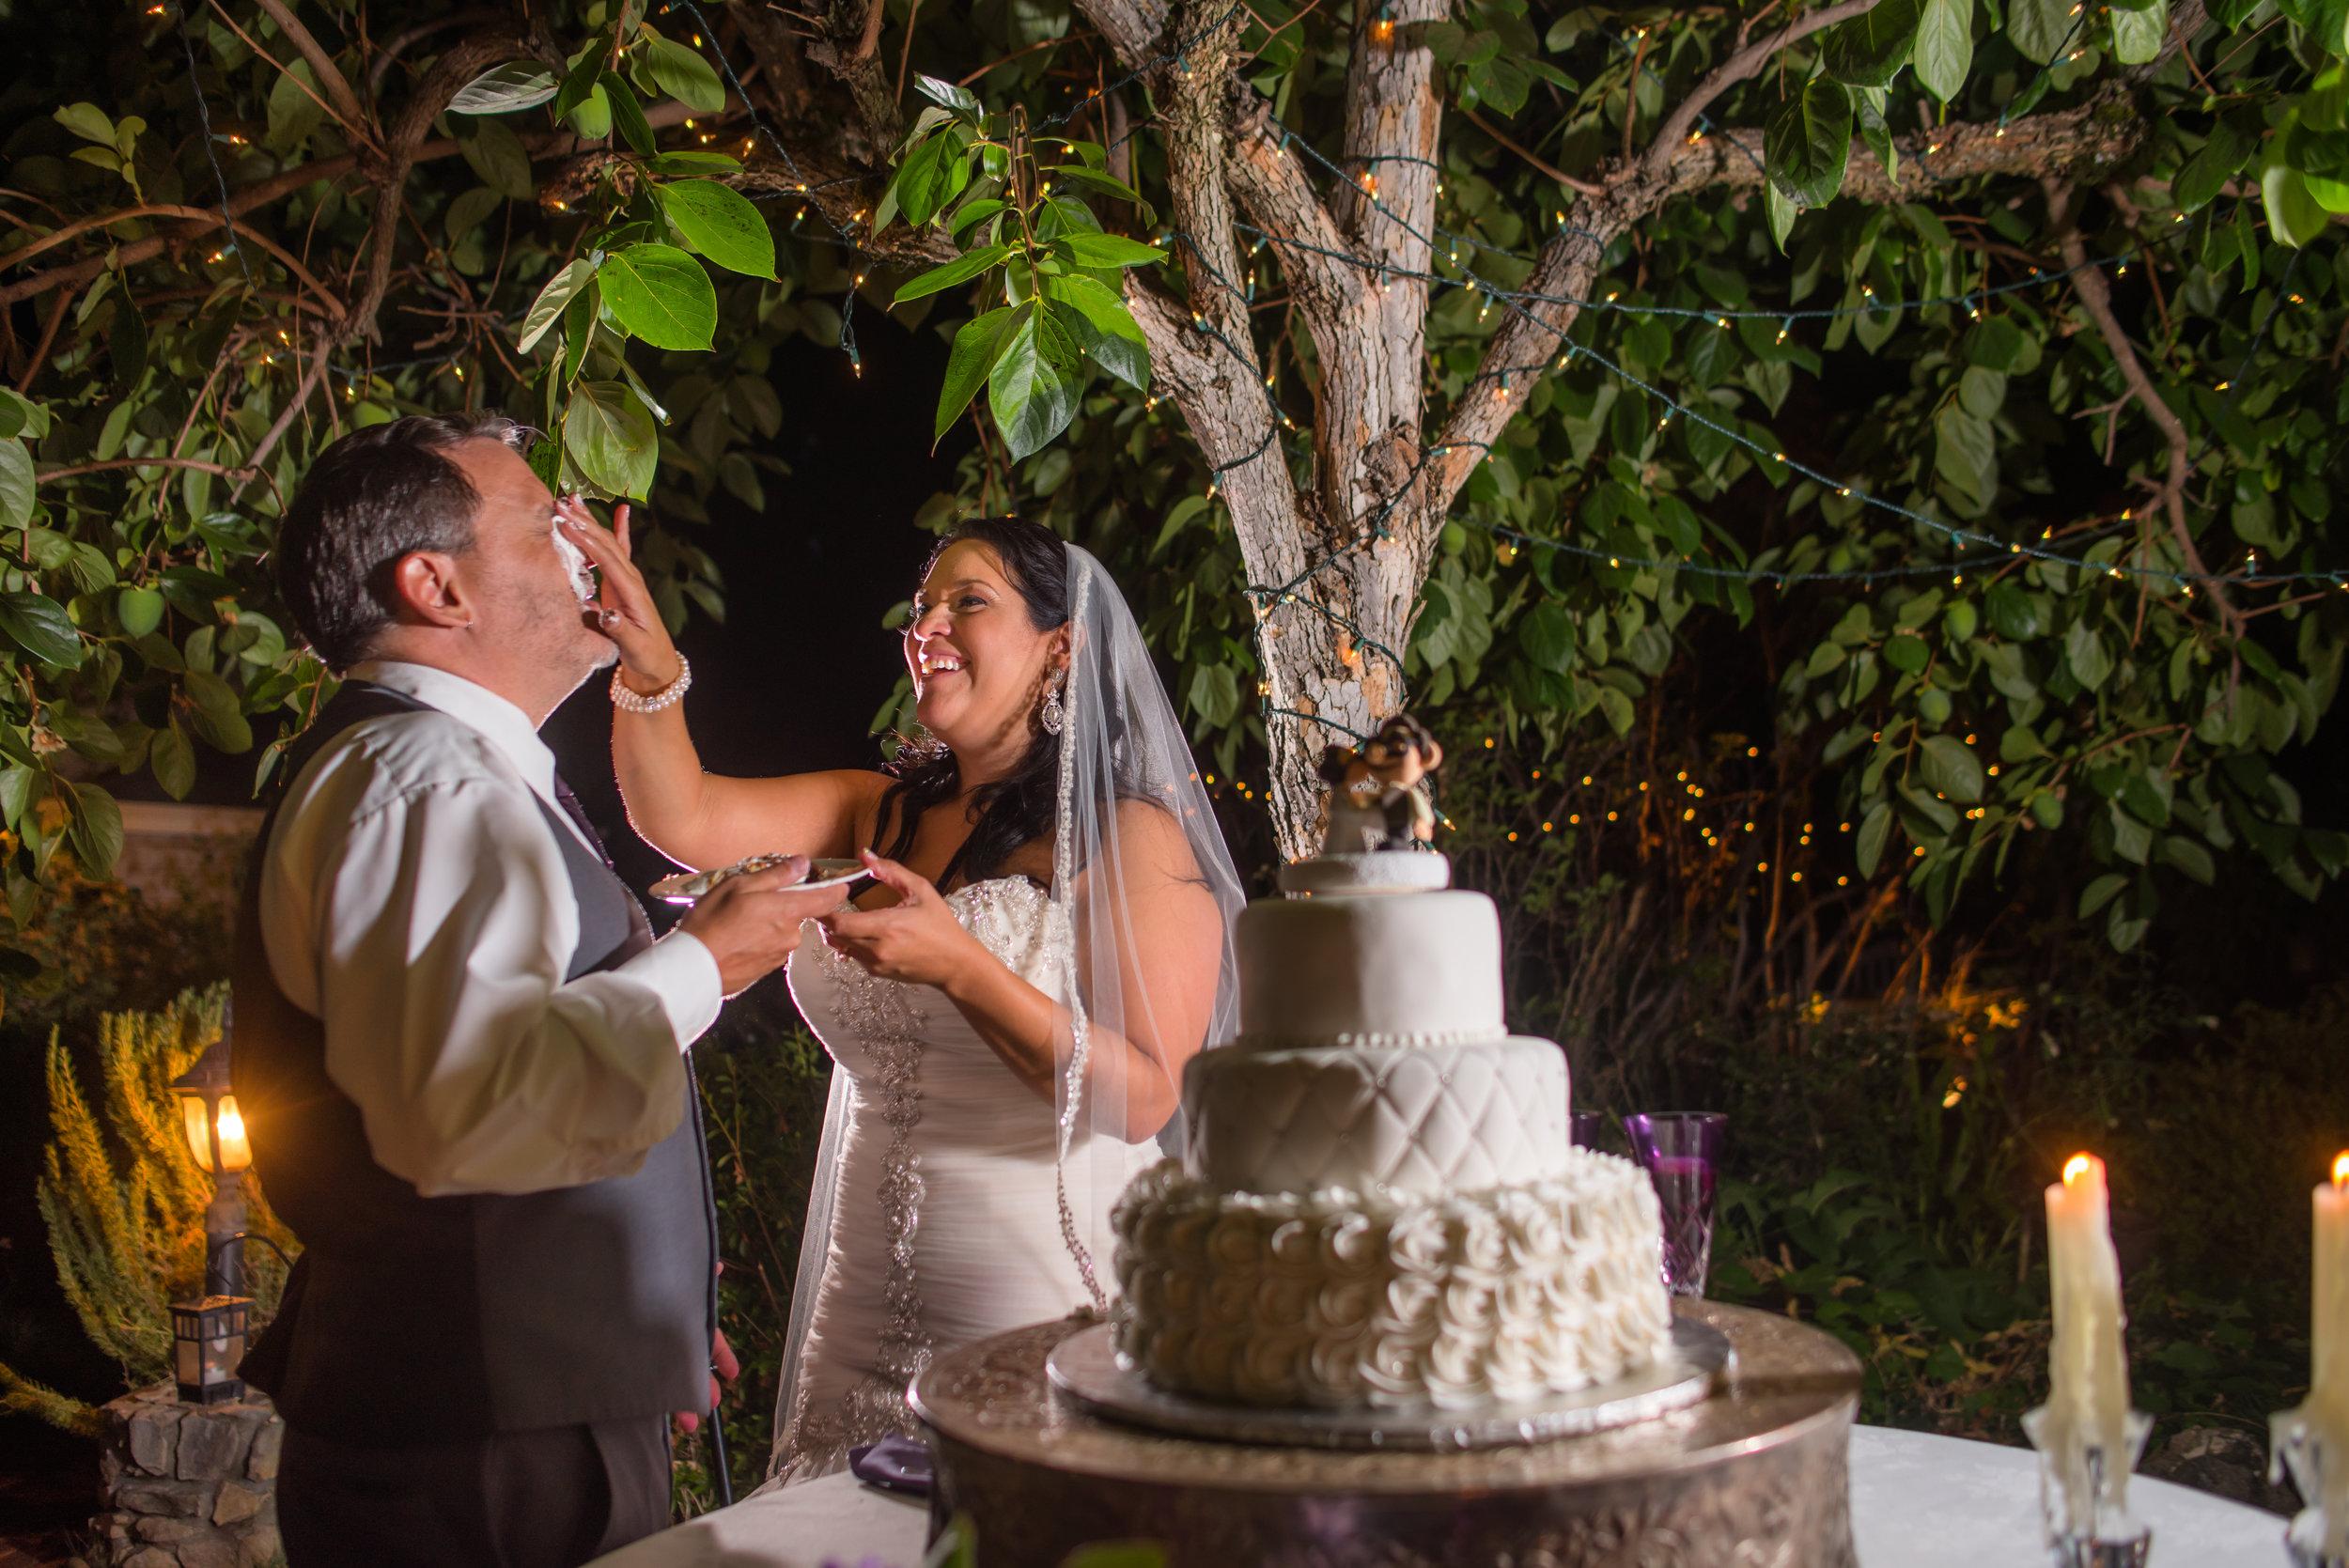 erika-seth-034-monte-verde-inn-sacramento-wedding-photographer-katherine-nicole-photography.JPG